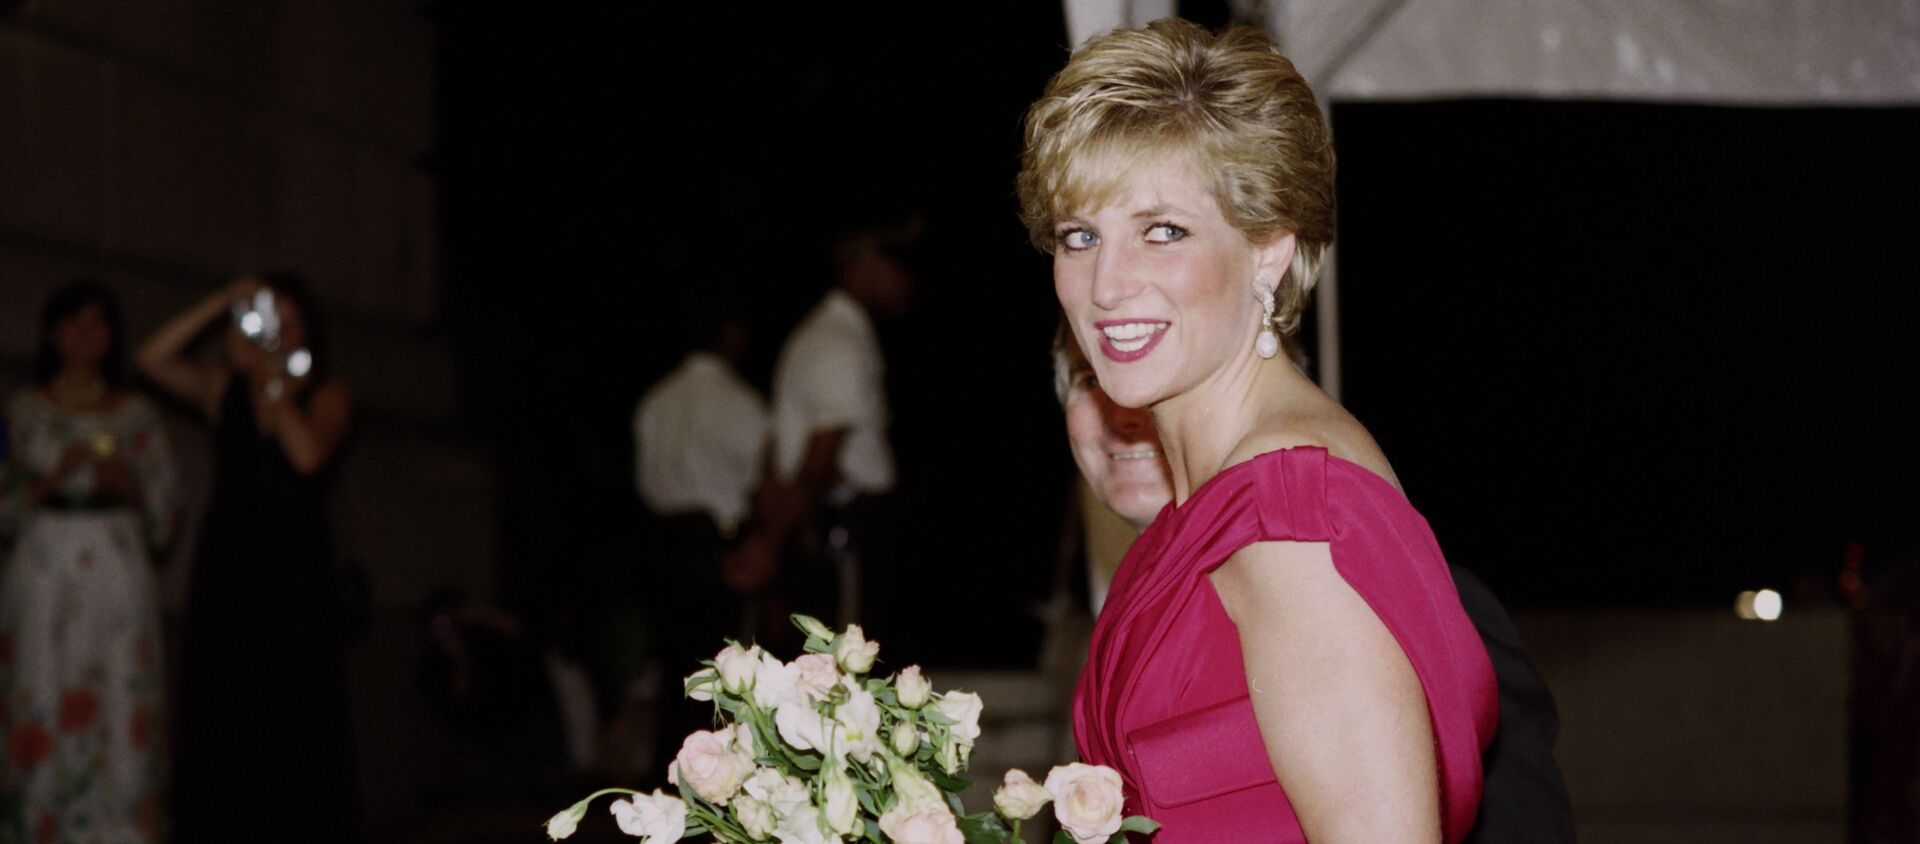 Lady Diana, la princesa de Gales - Sputnik Mundo, 1920, 09.11.2020